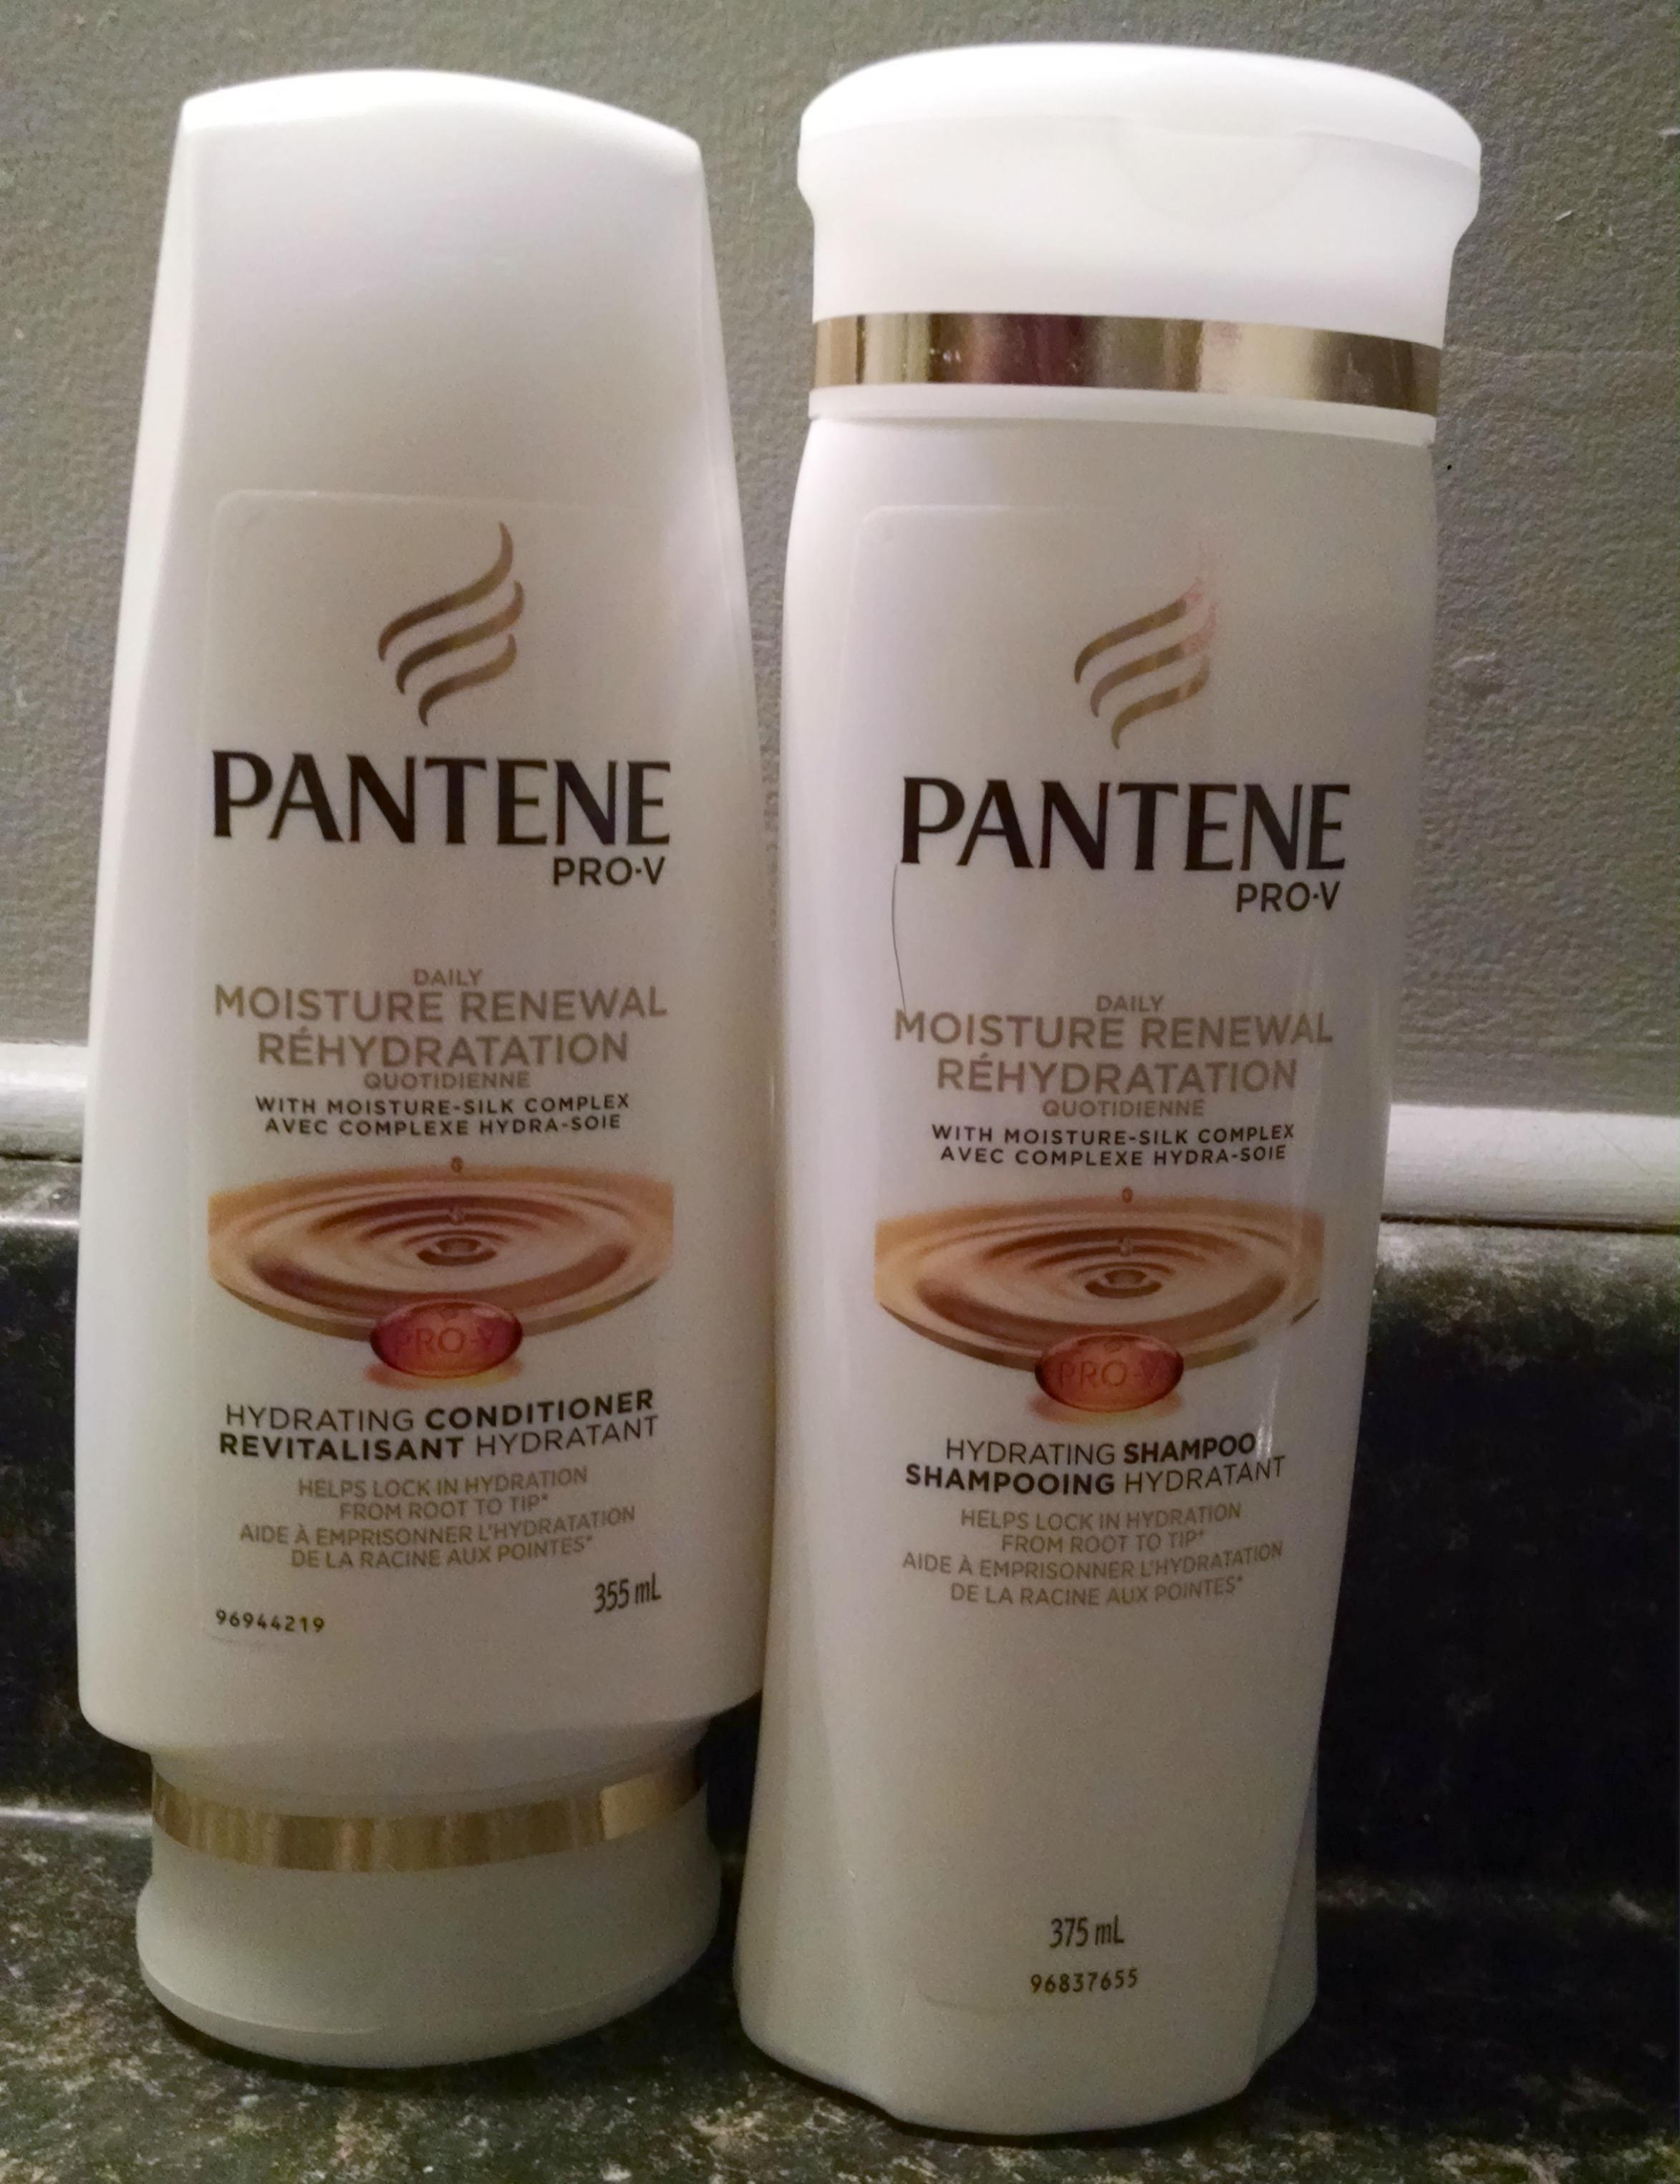 Pantene-review